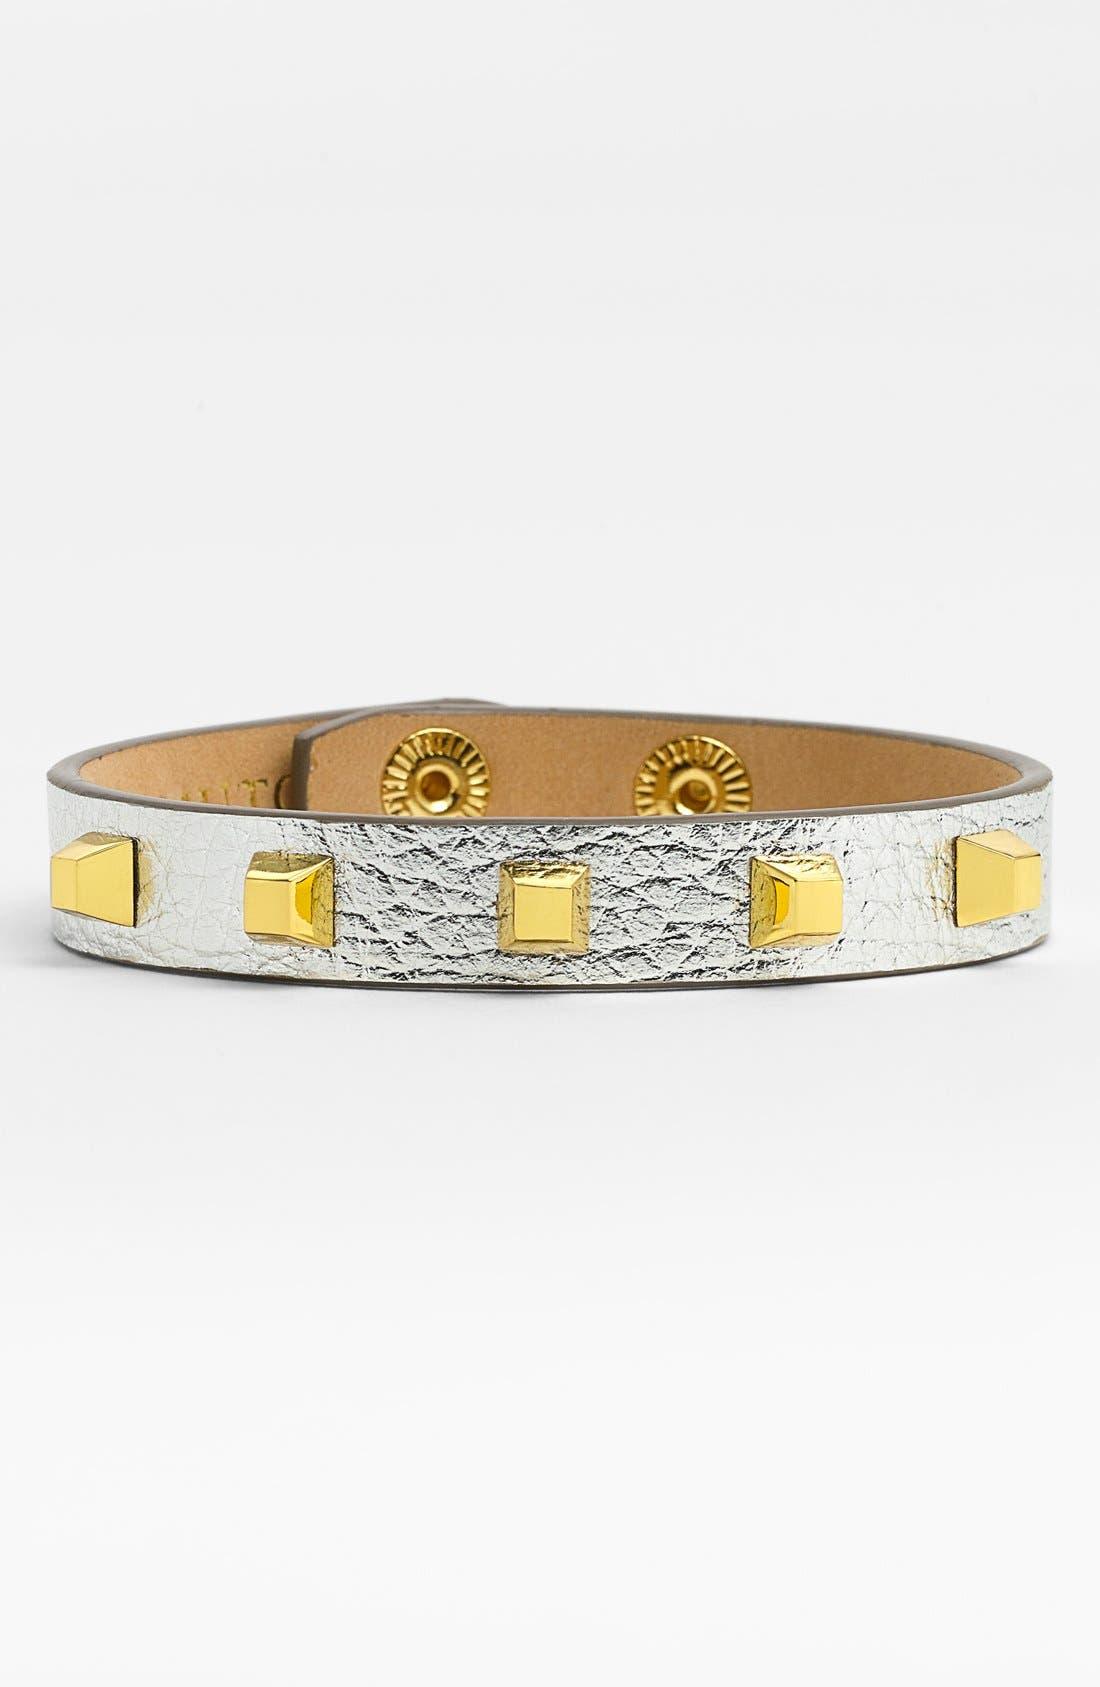 Studded Leather Bracelet,                             Main thumbnail 1, color,                             040